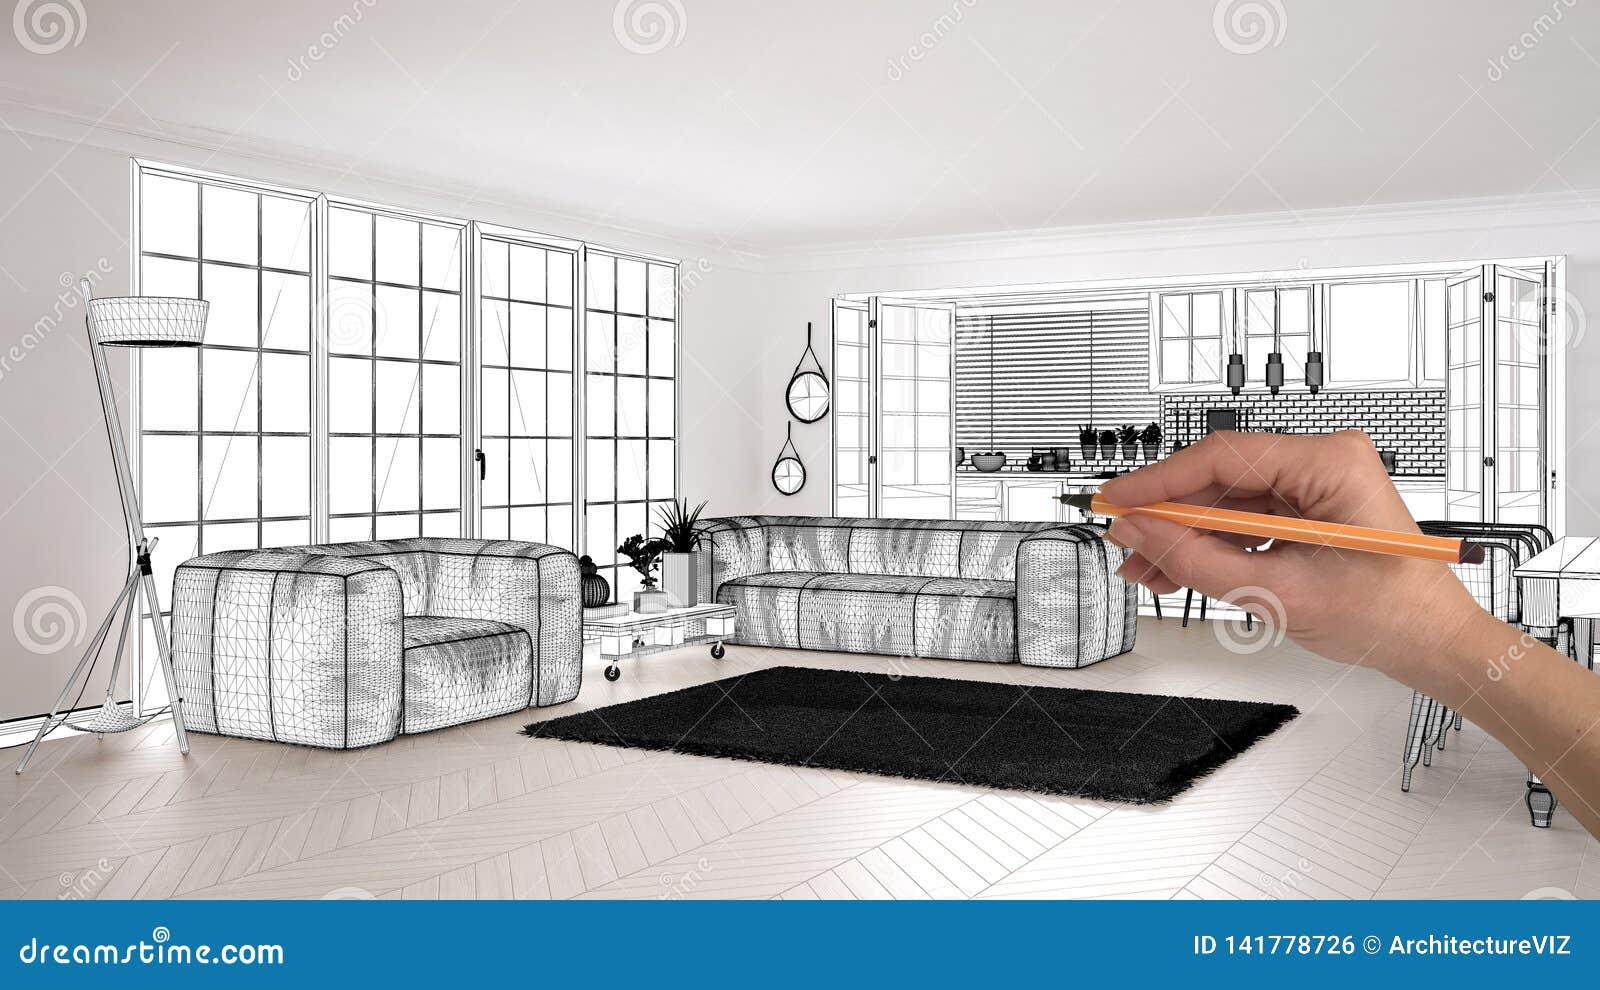 Unfinished Project Under Construction Draft Concept Interior Design Sketch Hand Drawing Scandinavian Living Room Blueprint Stock Photo Image Of Illustration Idea 141778726